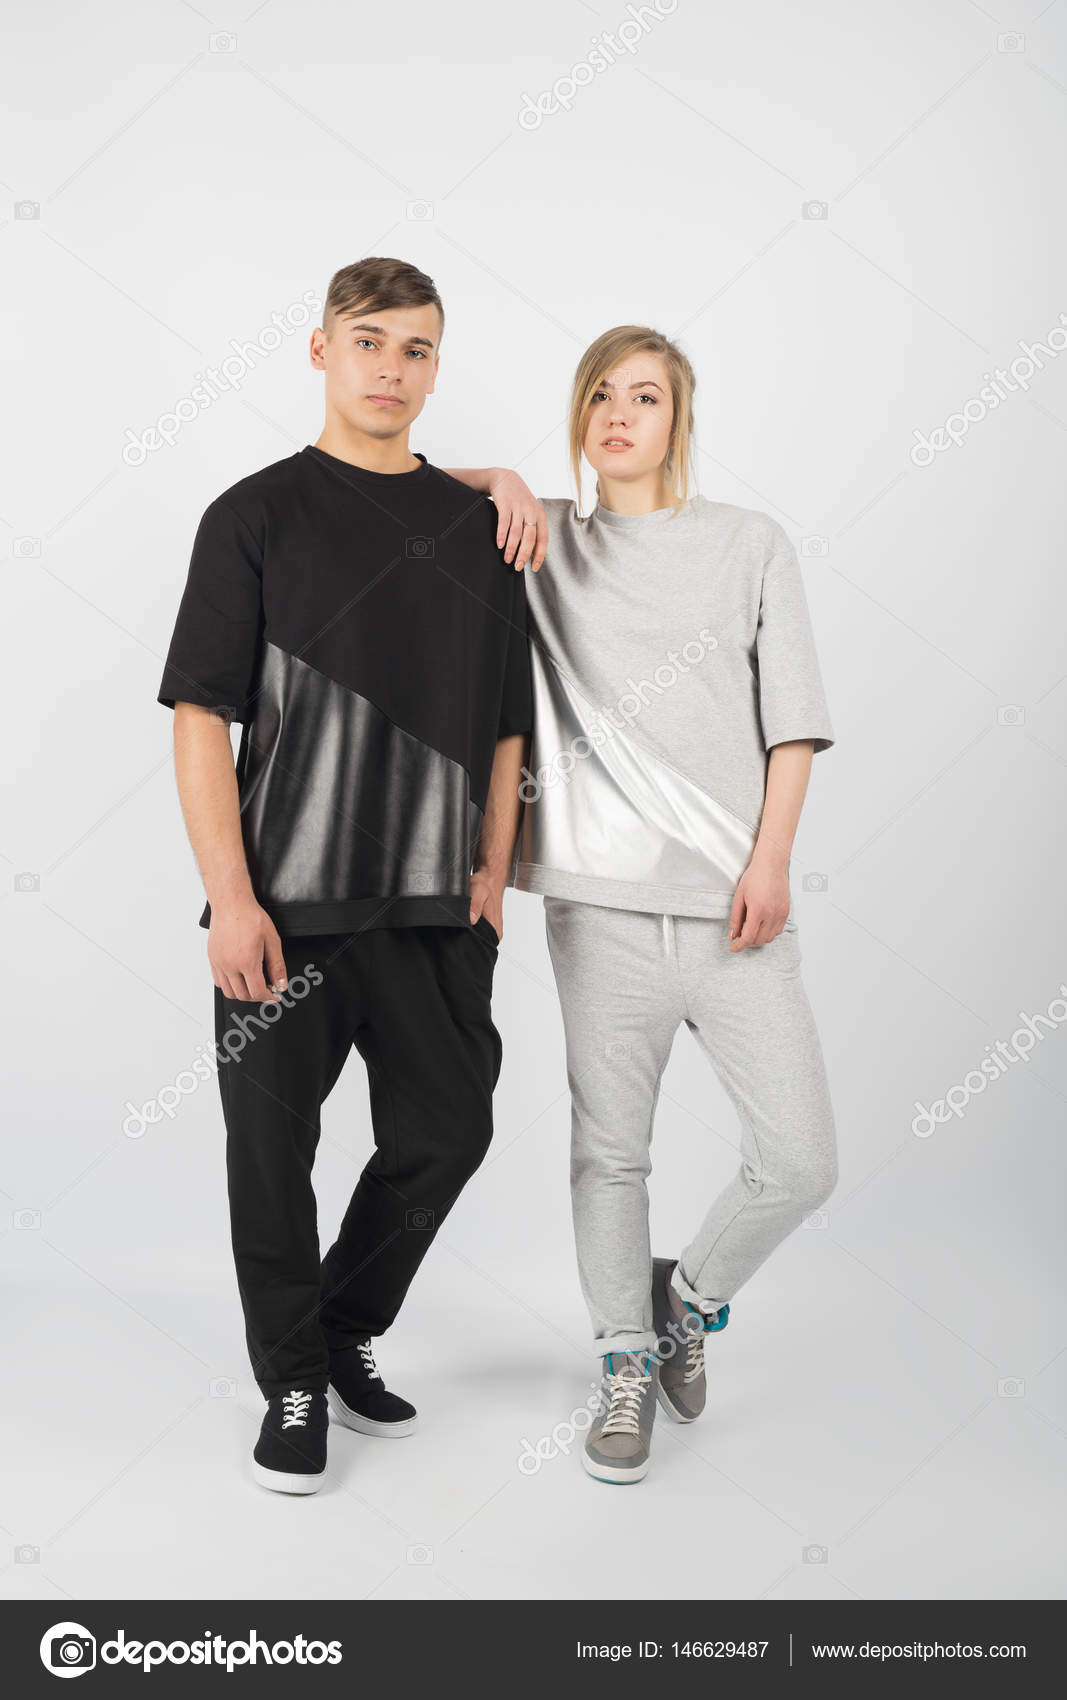 7b7465c6405 Αγόρι και κορίτσι. Νεαρός μυώδης άνδρας φορώντας μαύρα ρούχα και αθλητικά  παπούτσια με κορίτσι με γκρίζα ρούχα που απομονώνονται σε λευκό φόντο —  Εικόνα από ...